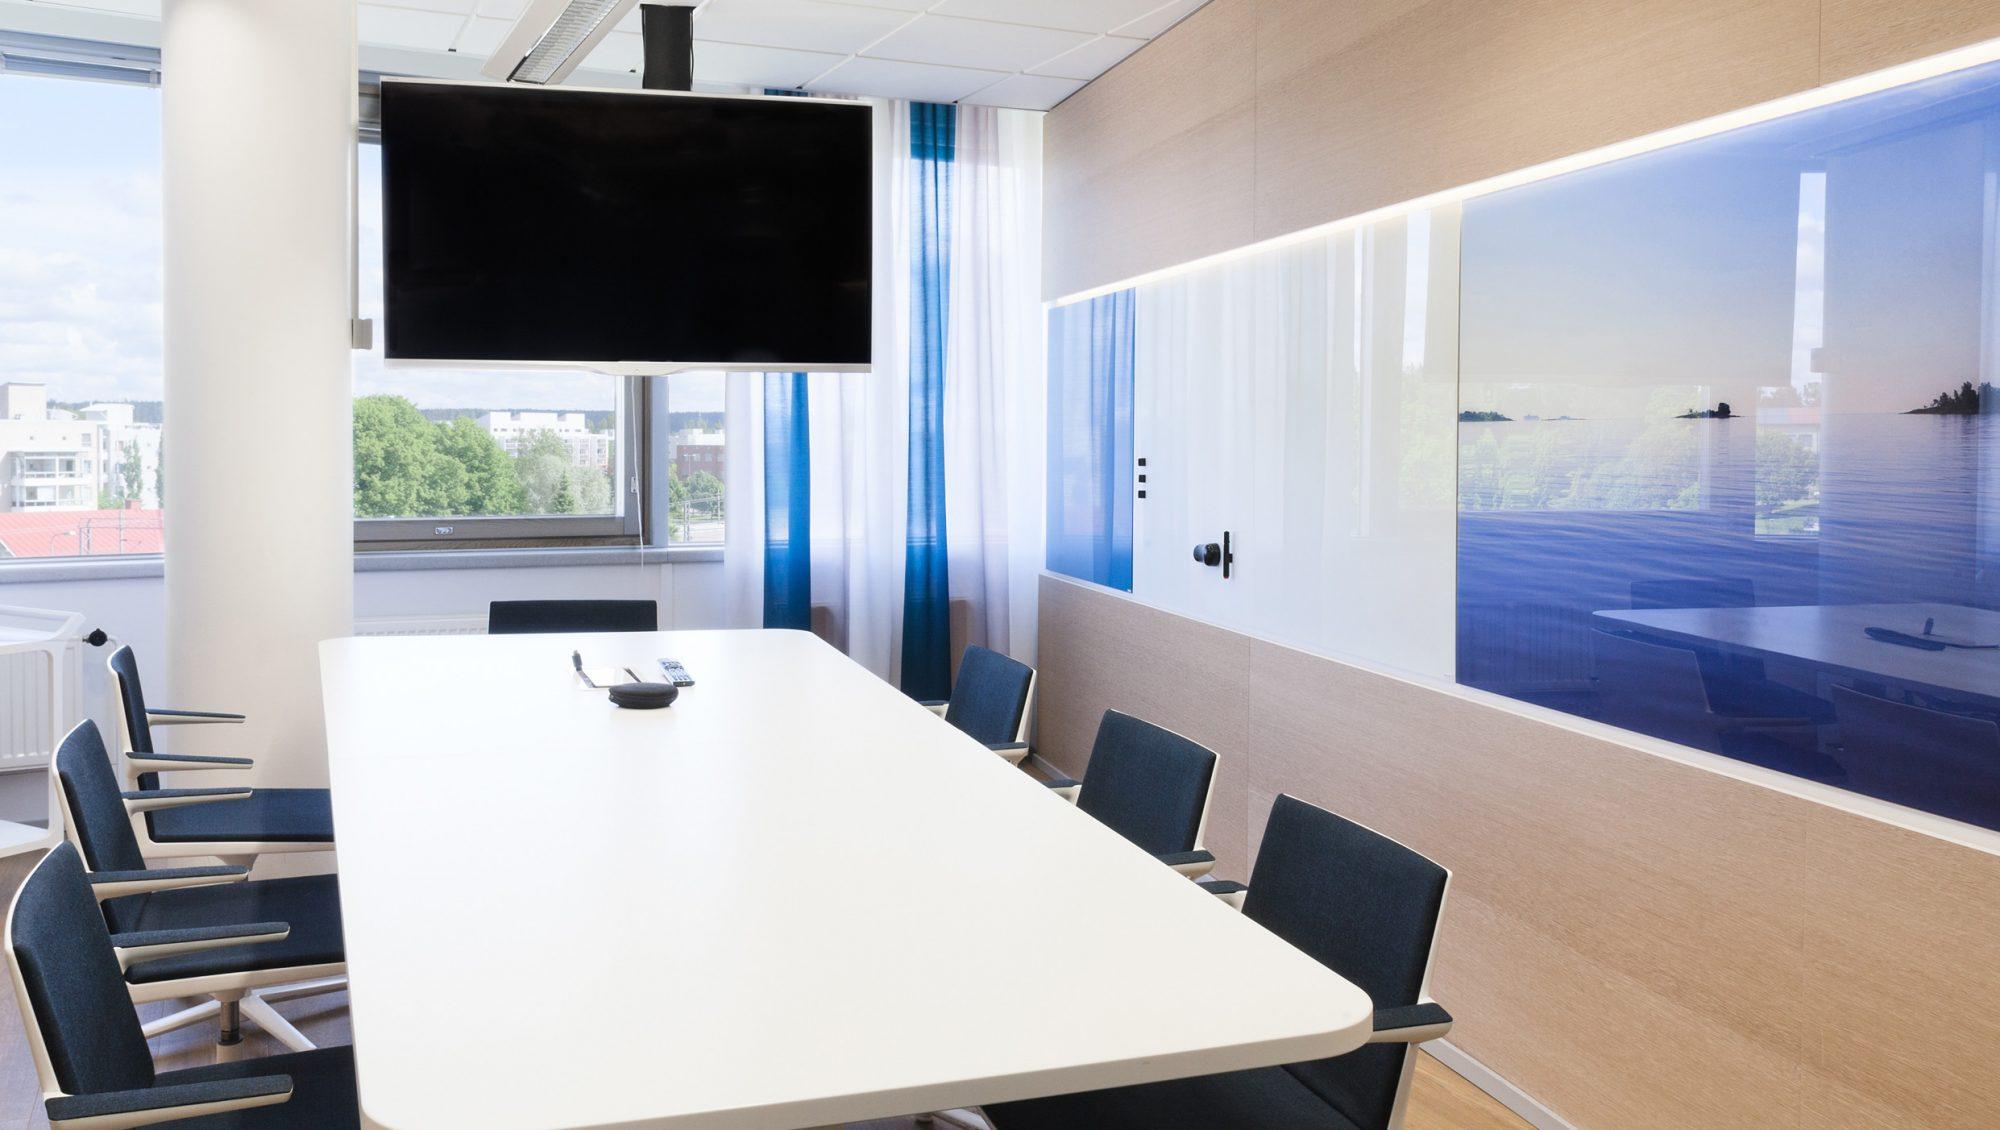 City-of-Espoo-Mayor's-office-GI-Project-2